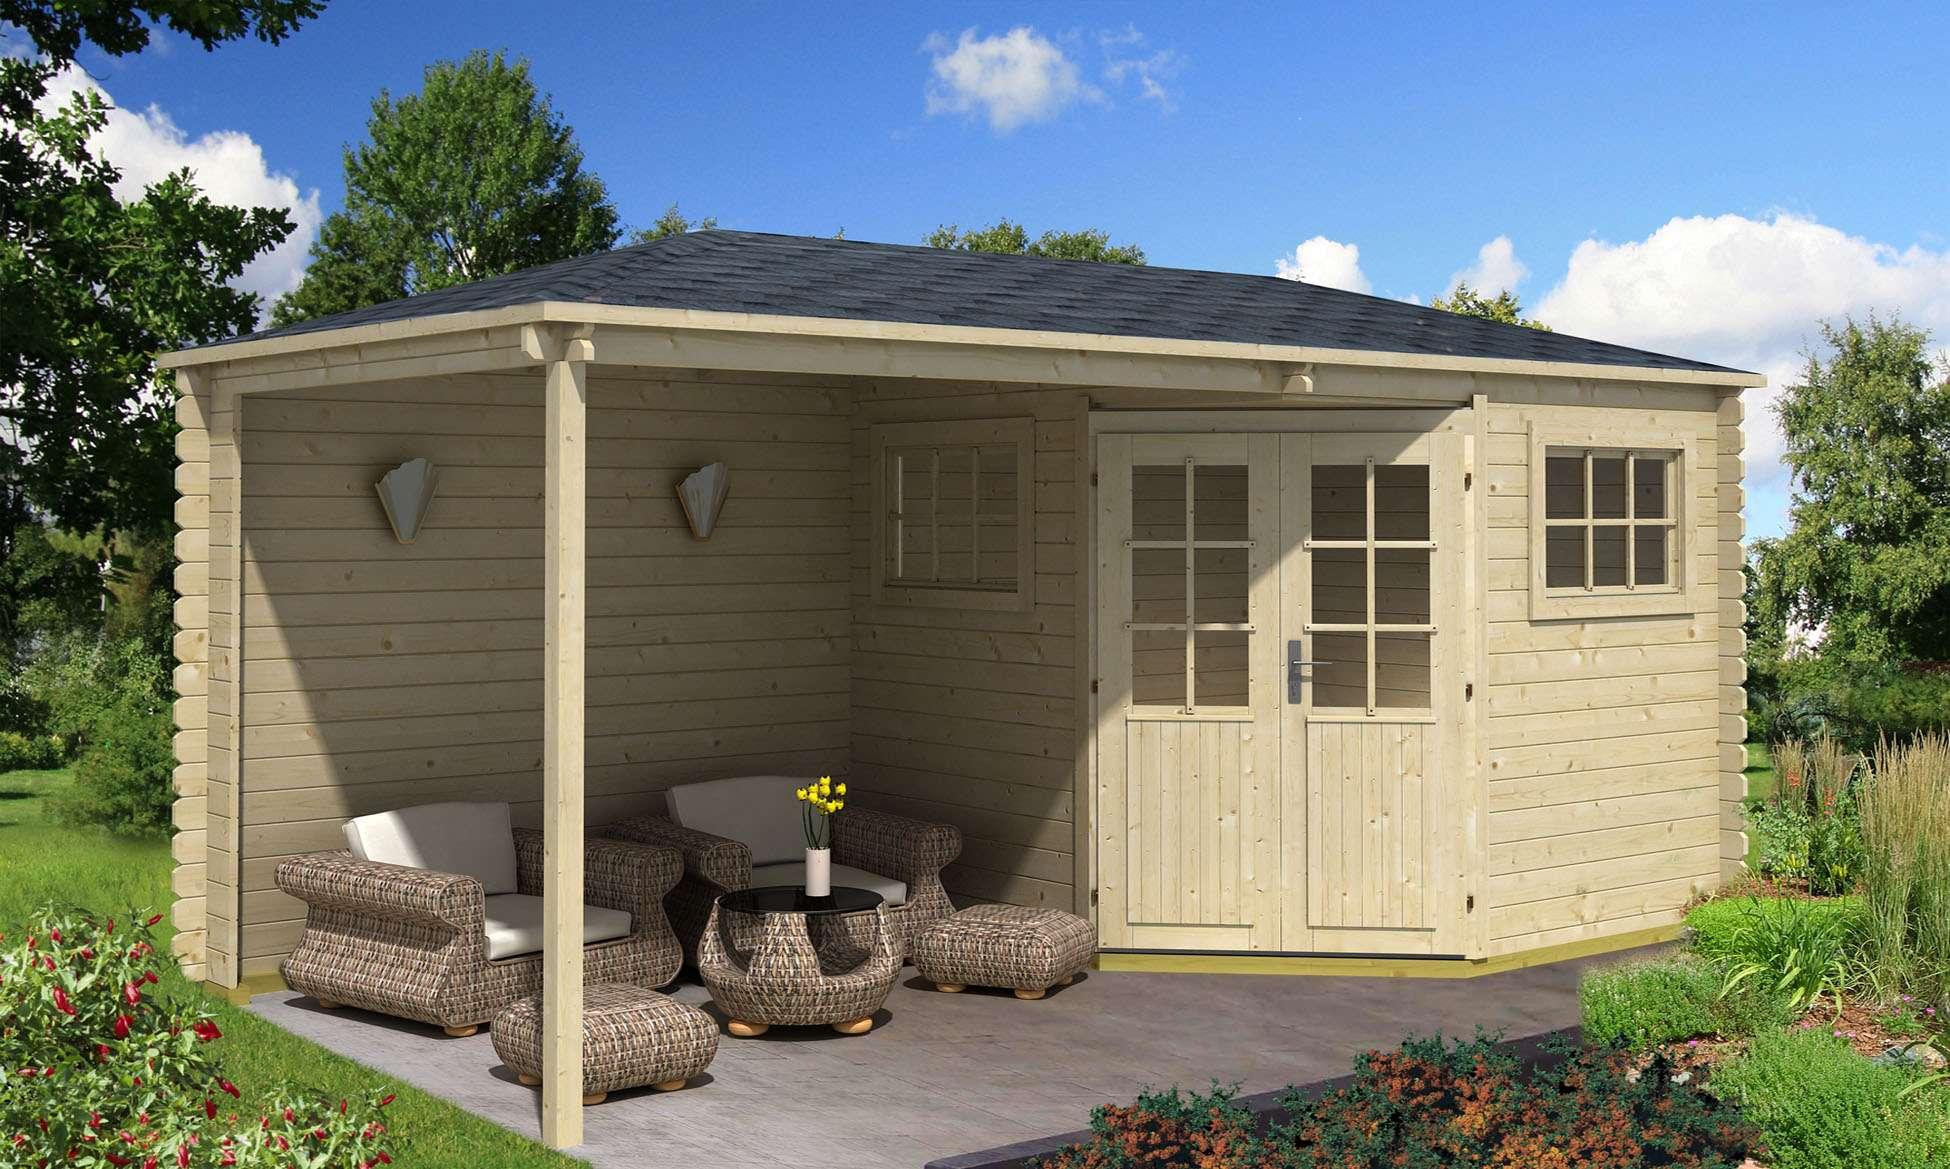 gartenhaus inklusive aufbau gt96 hitoiro. Black Bedroom Furniture Sets. Home Design Ideas